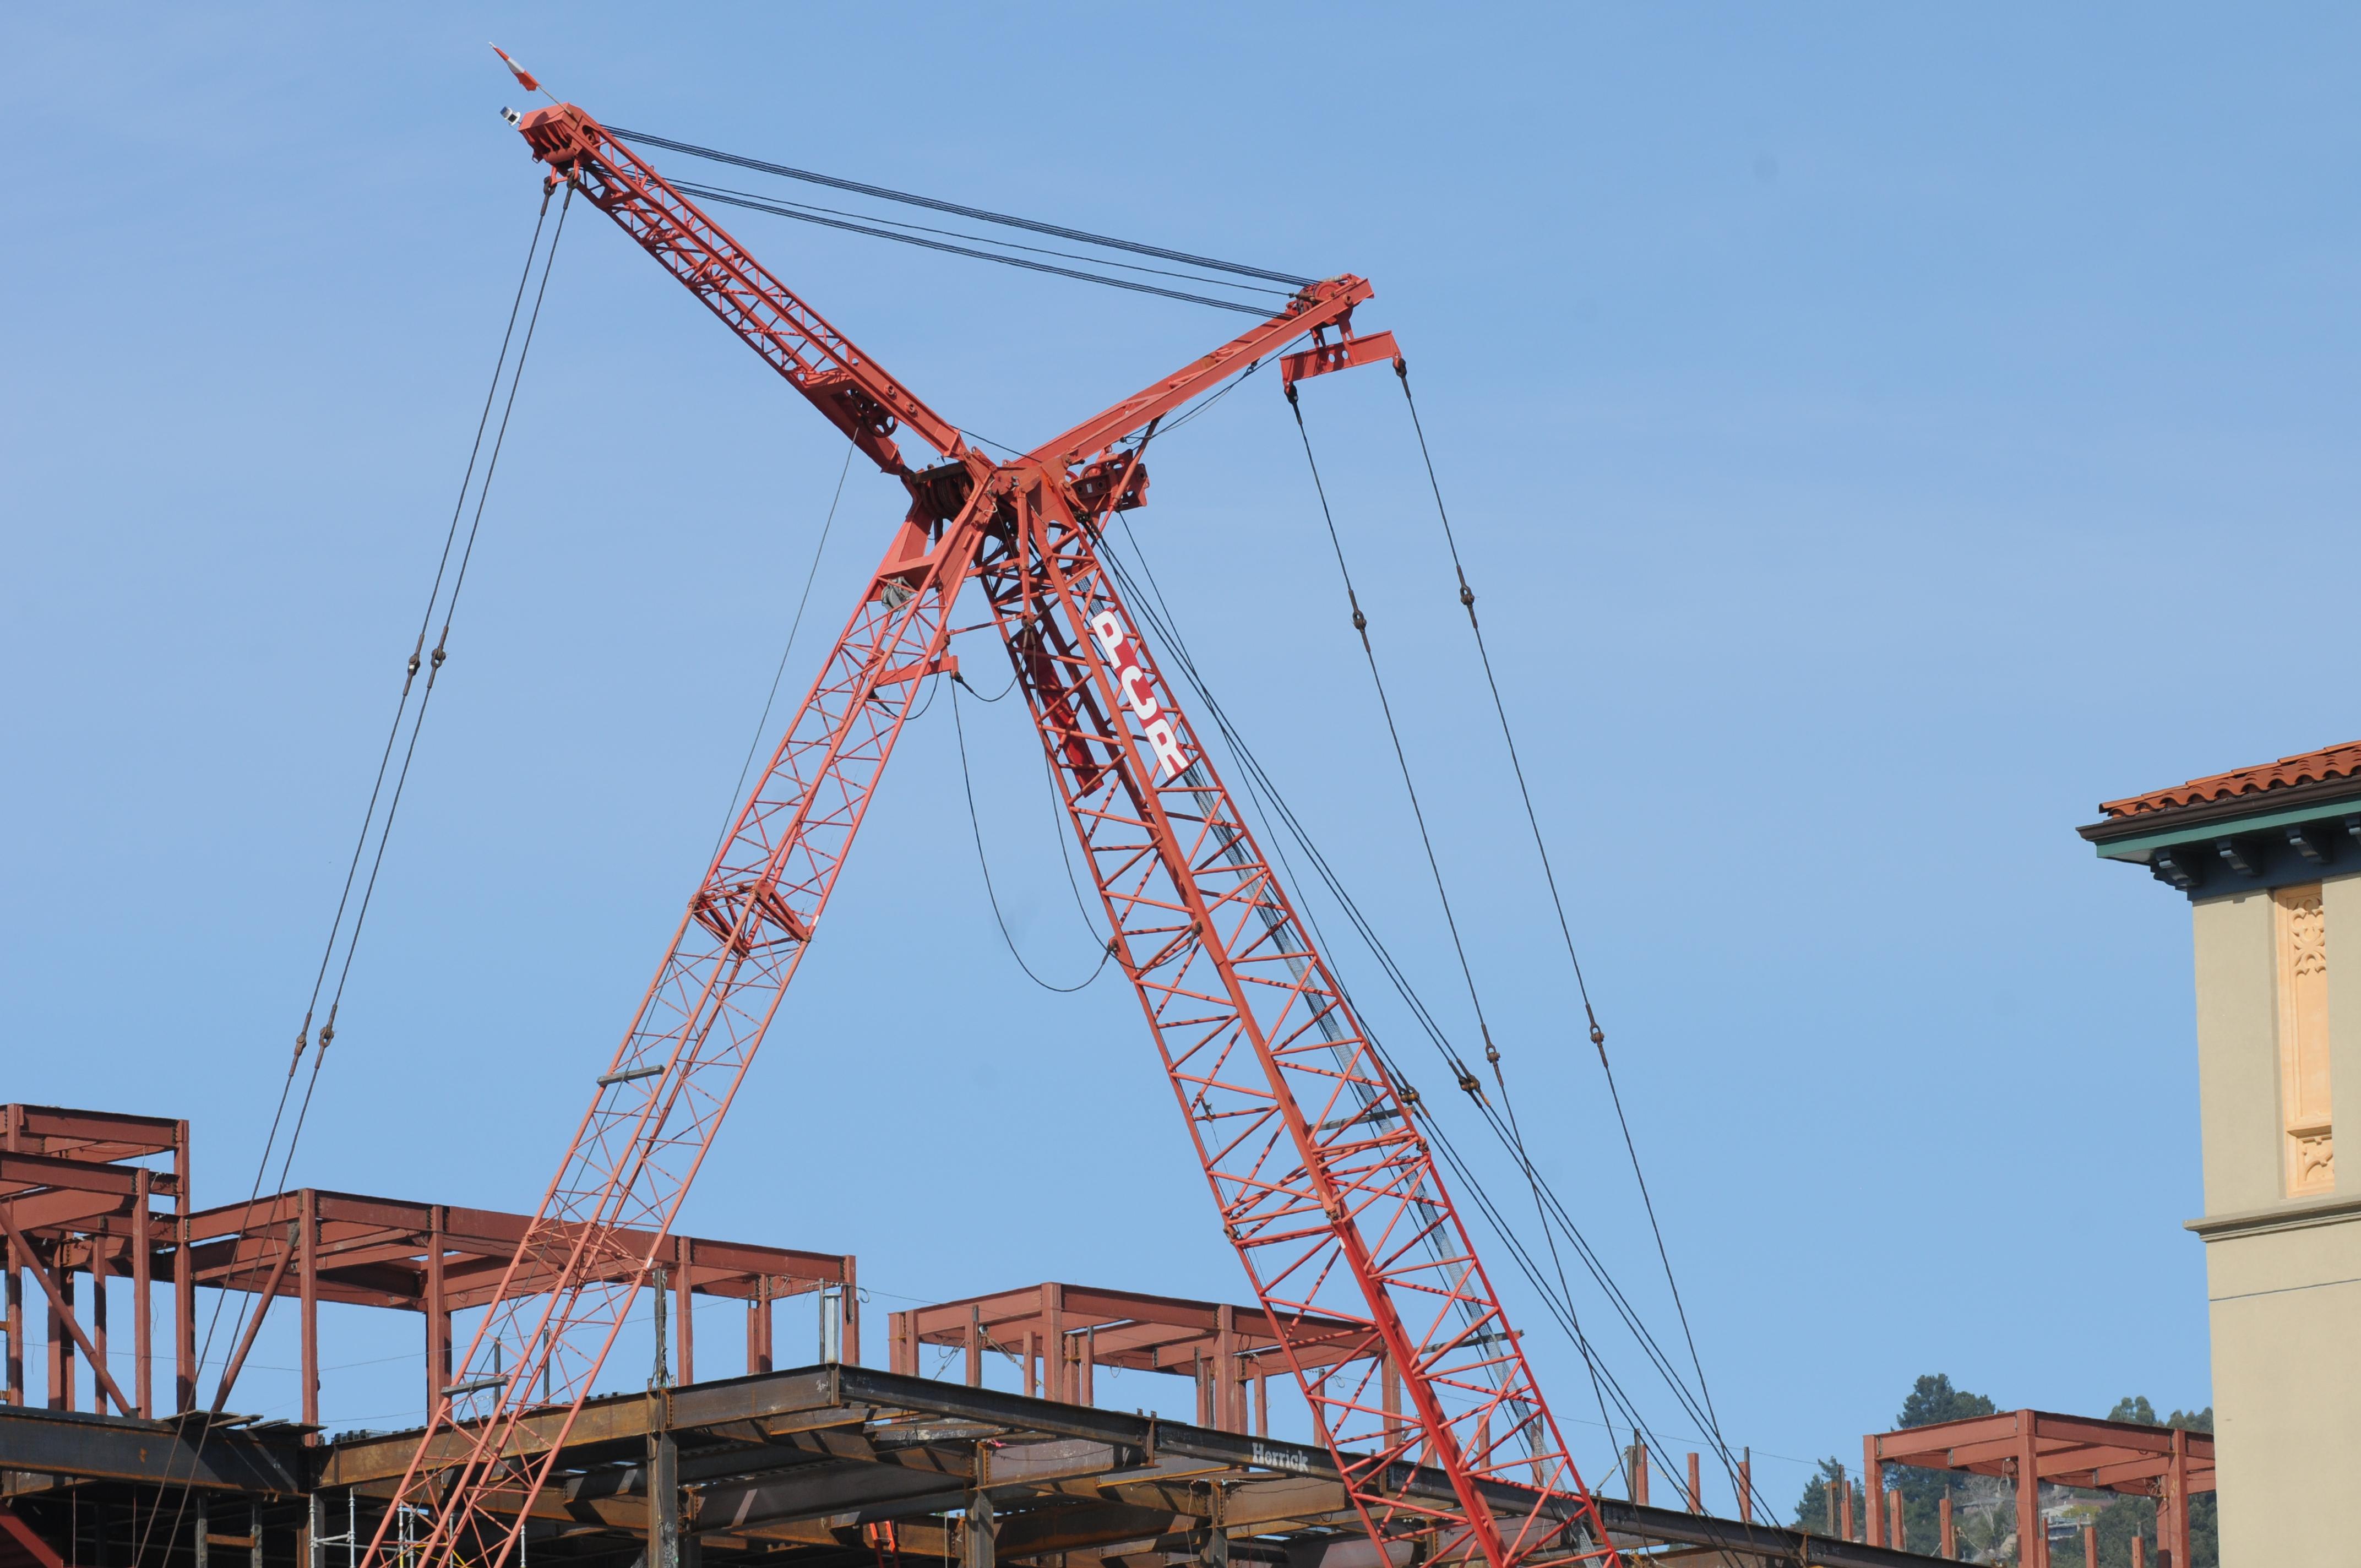 Construction crane 1 photo